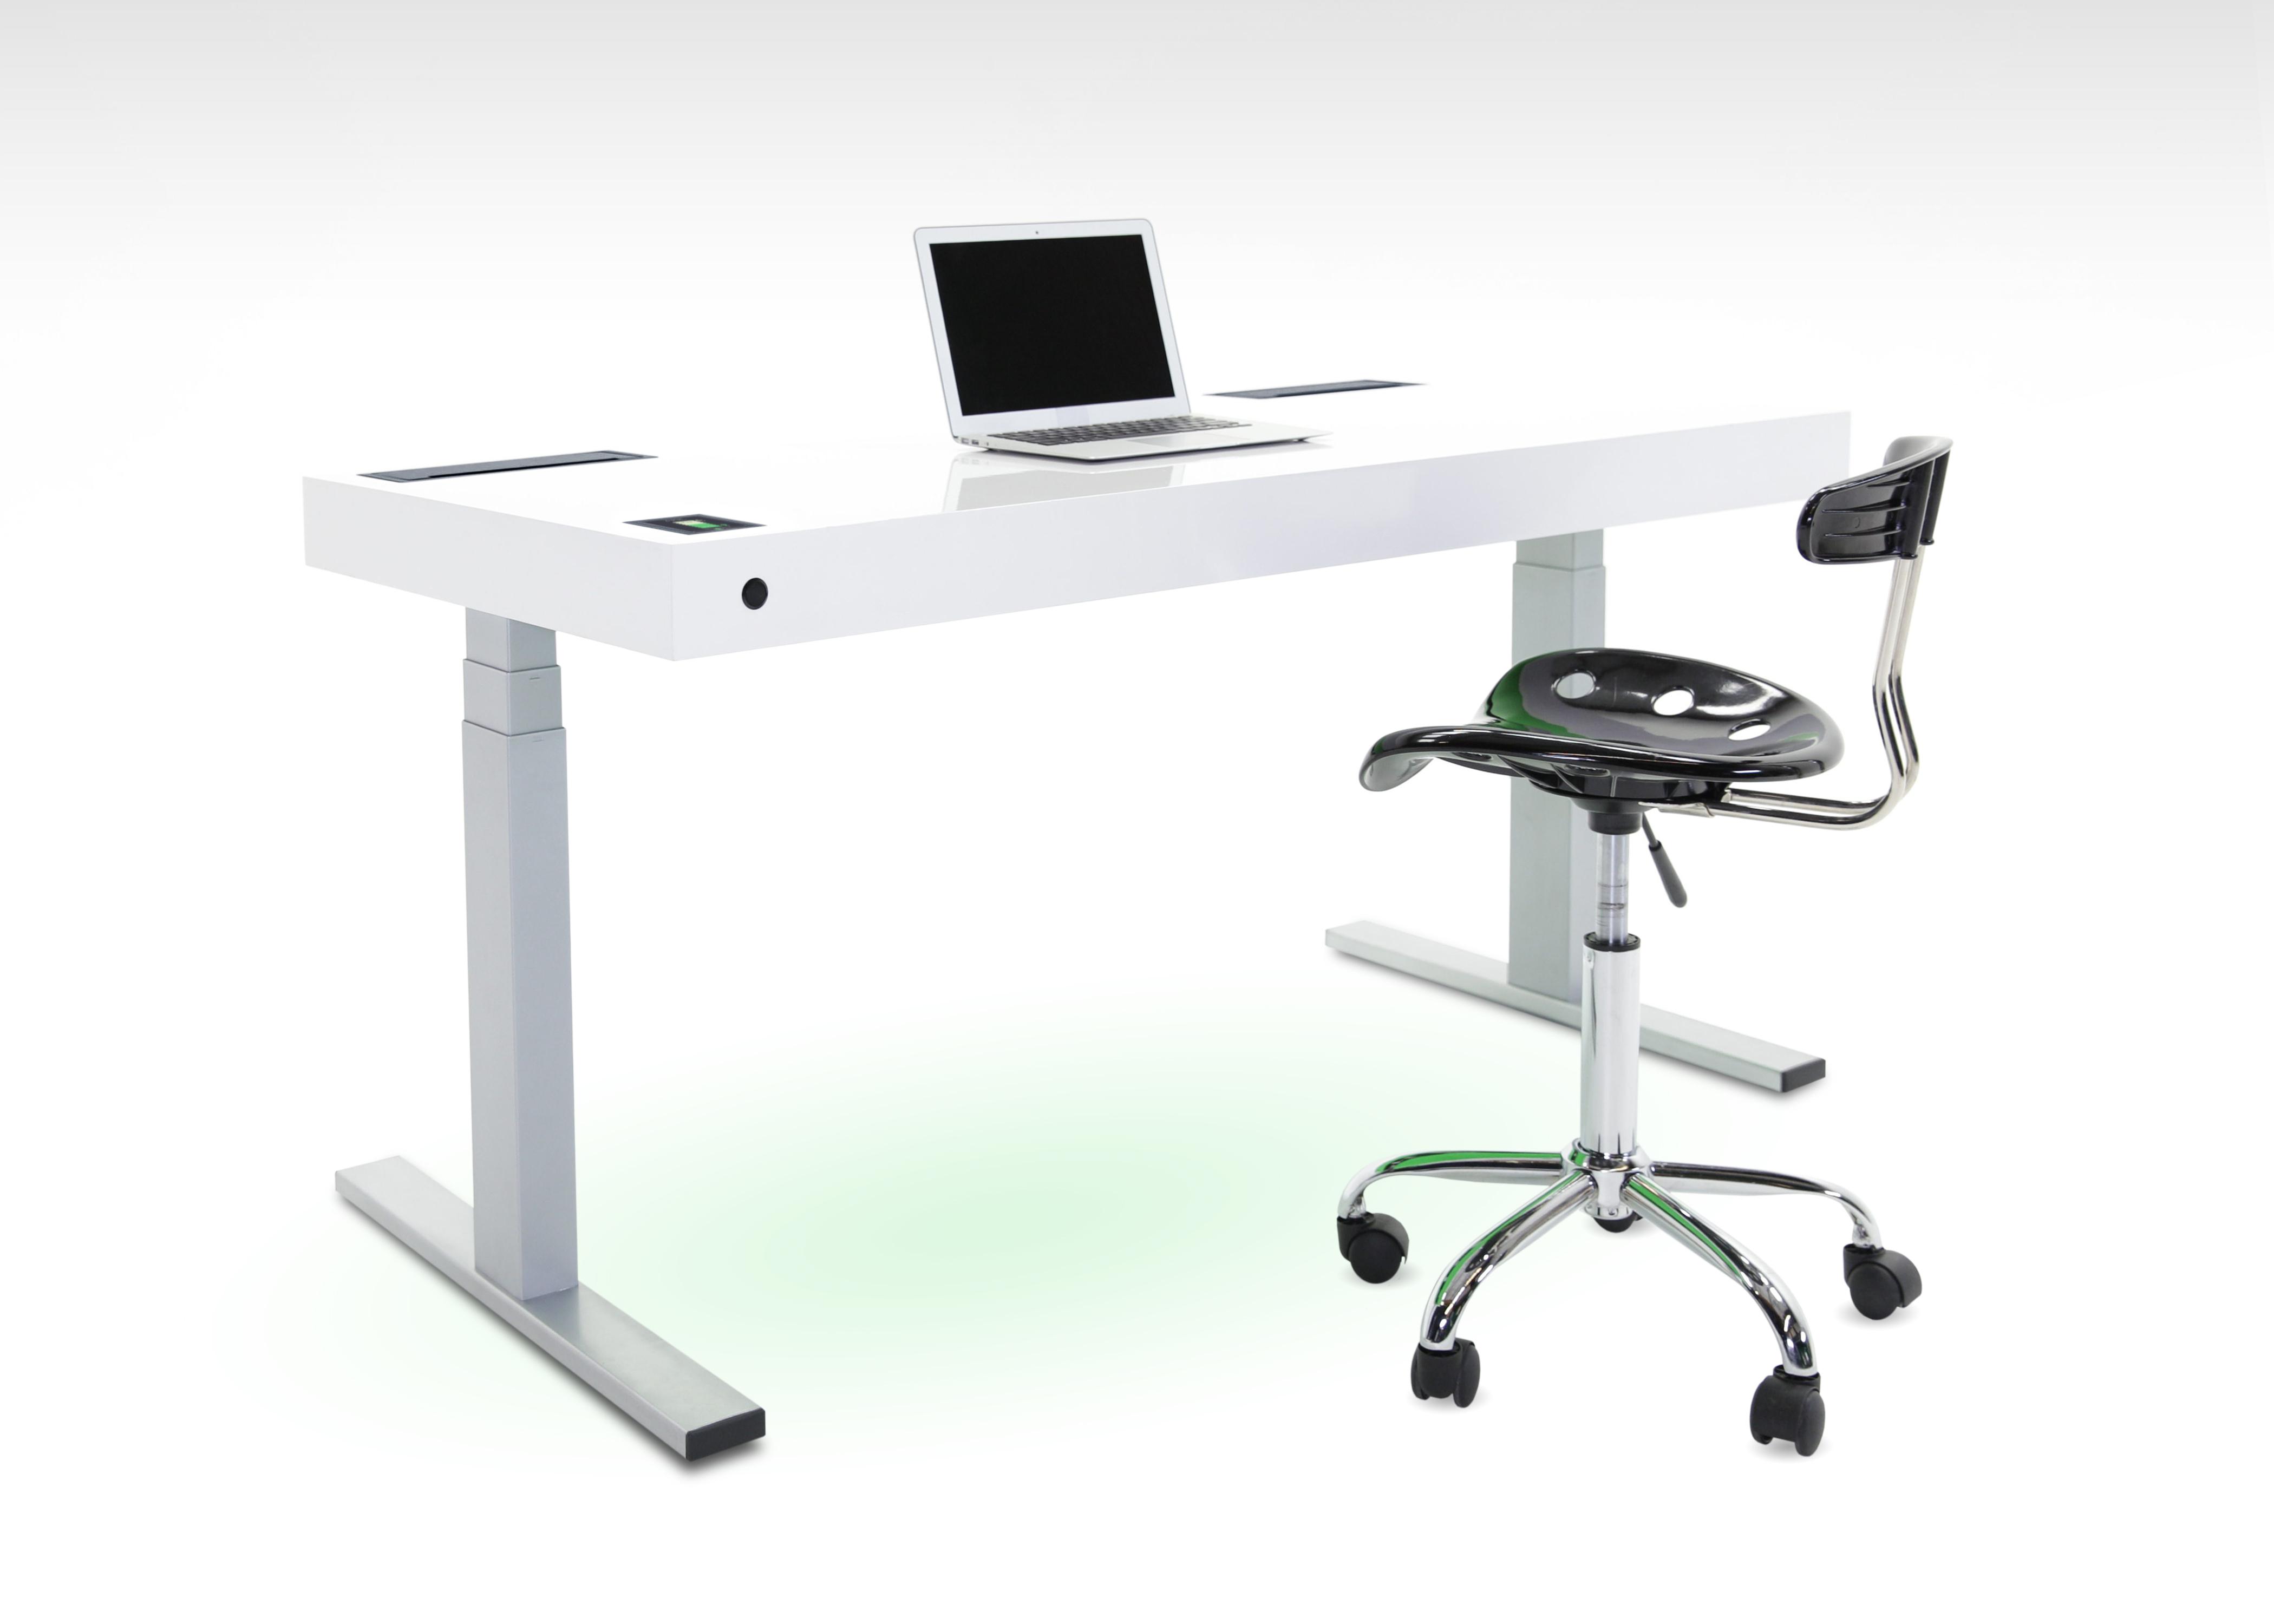 desk_wideangle_w_chair